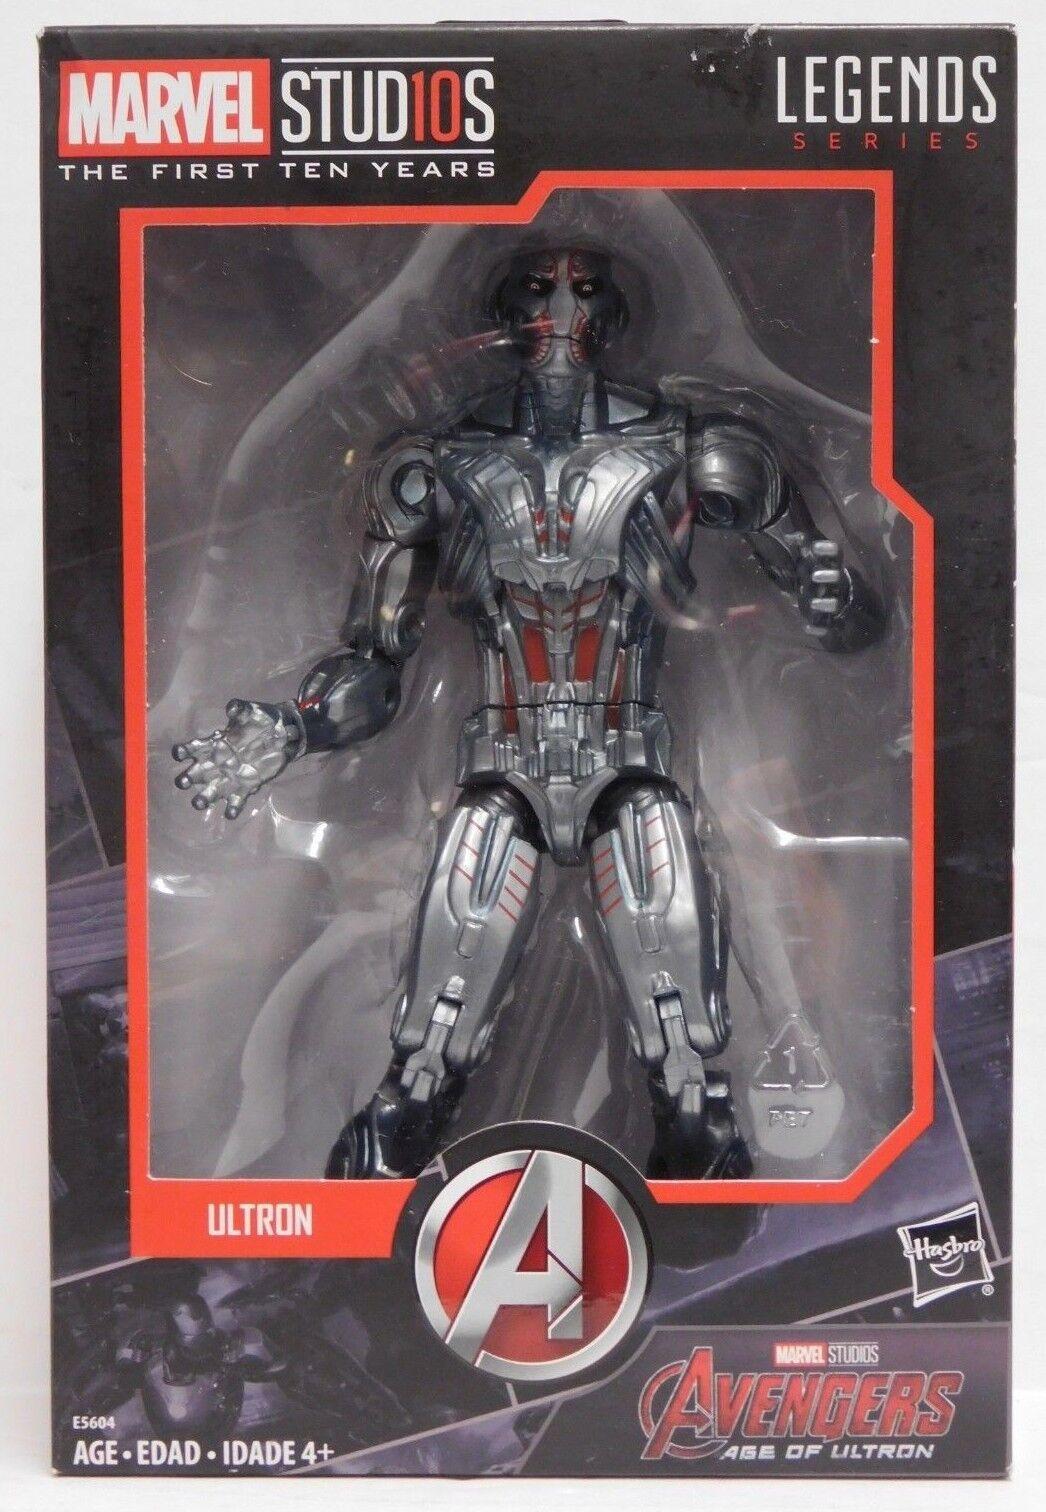 ULTRON - Hasbro Marvel Studios Legends Series Action Figure - NEW